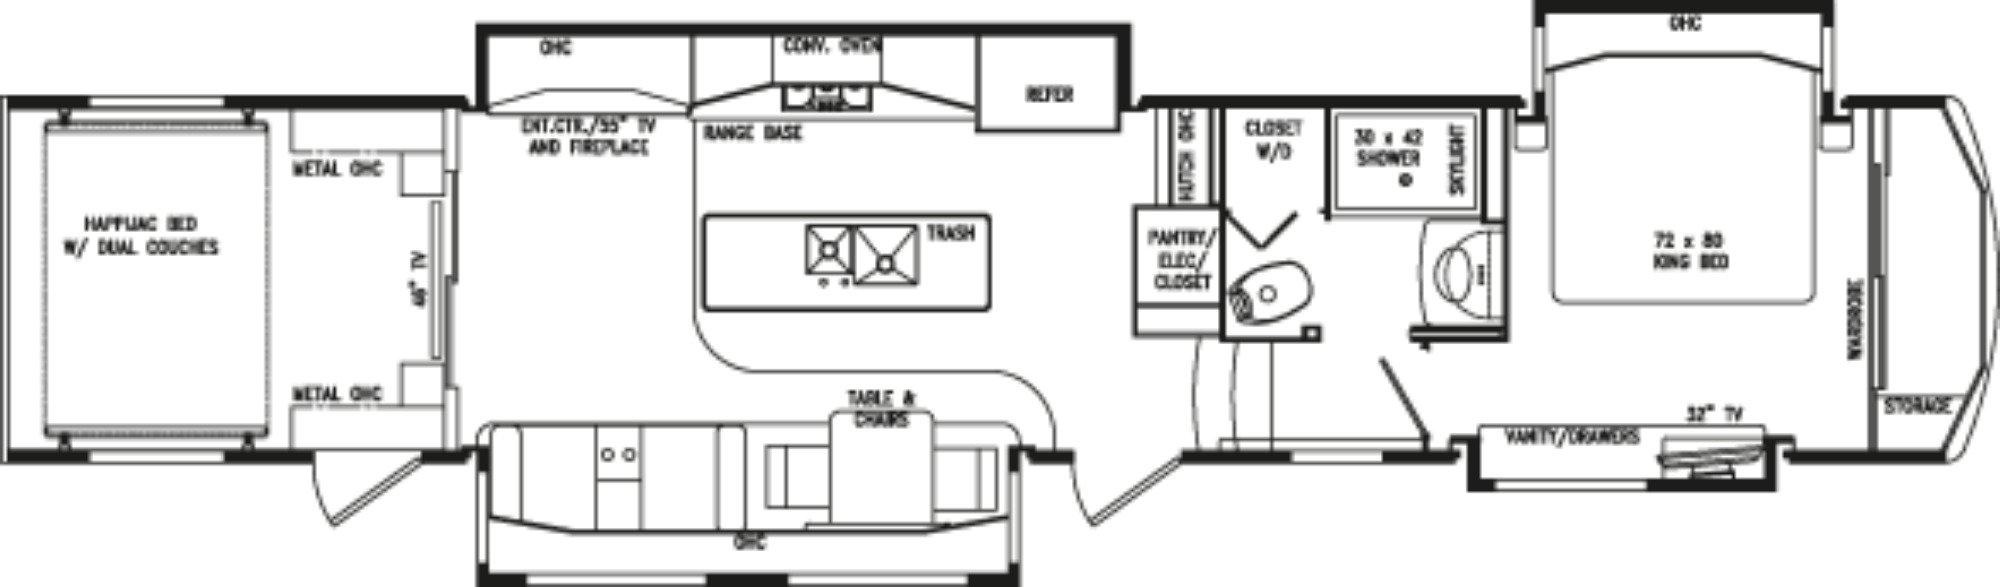 View Floor Plan for 2019 DRV LUXURY SUITES FULL HOUSE JX450